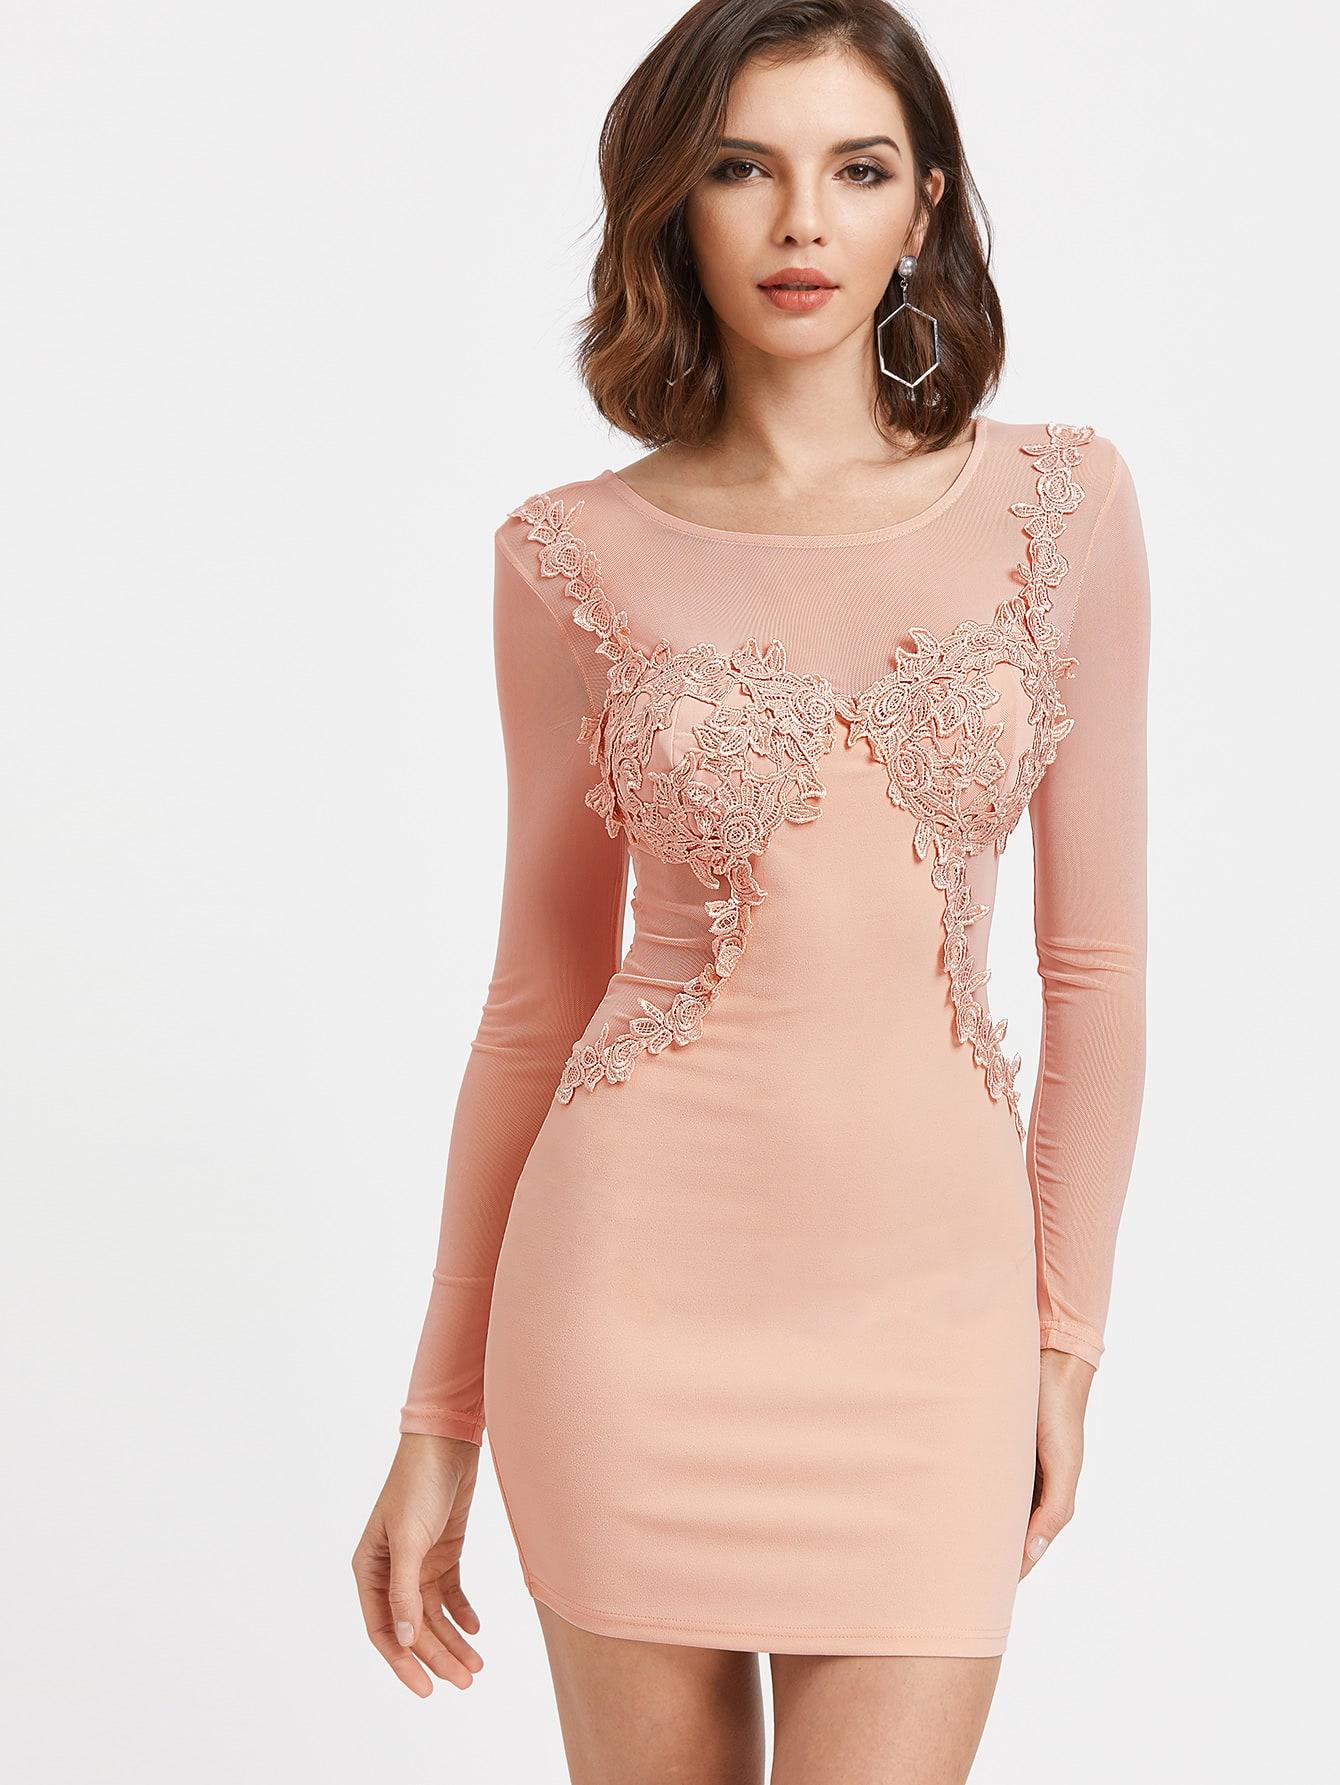 Pink Contrast Sheer Mesh Crochet Trim Bodycon Dress maison jules new junior s small s pink combo lace crepe contrast trim dress $89